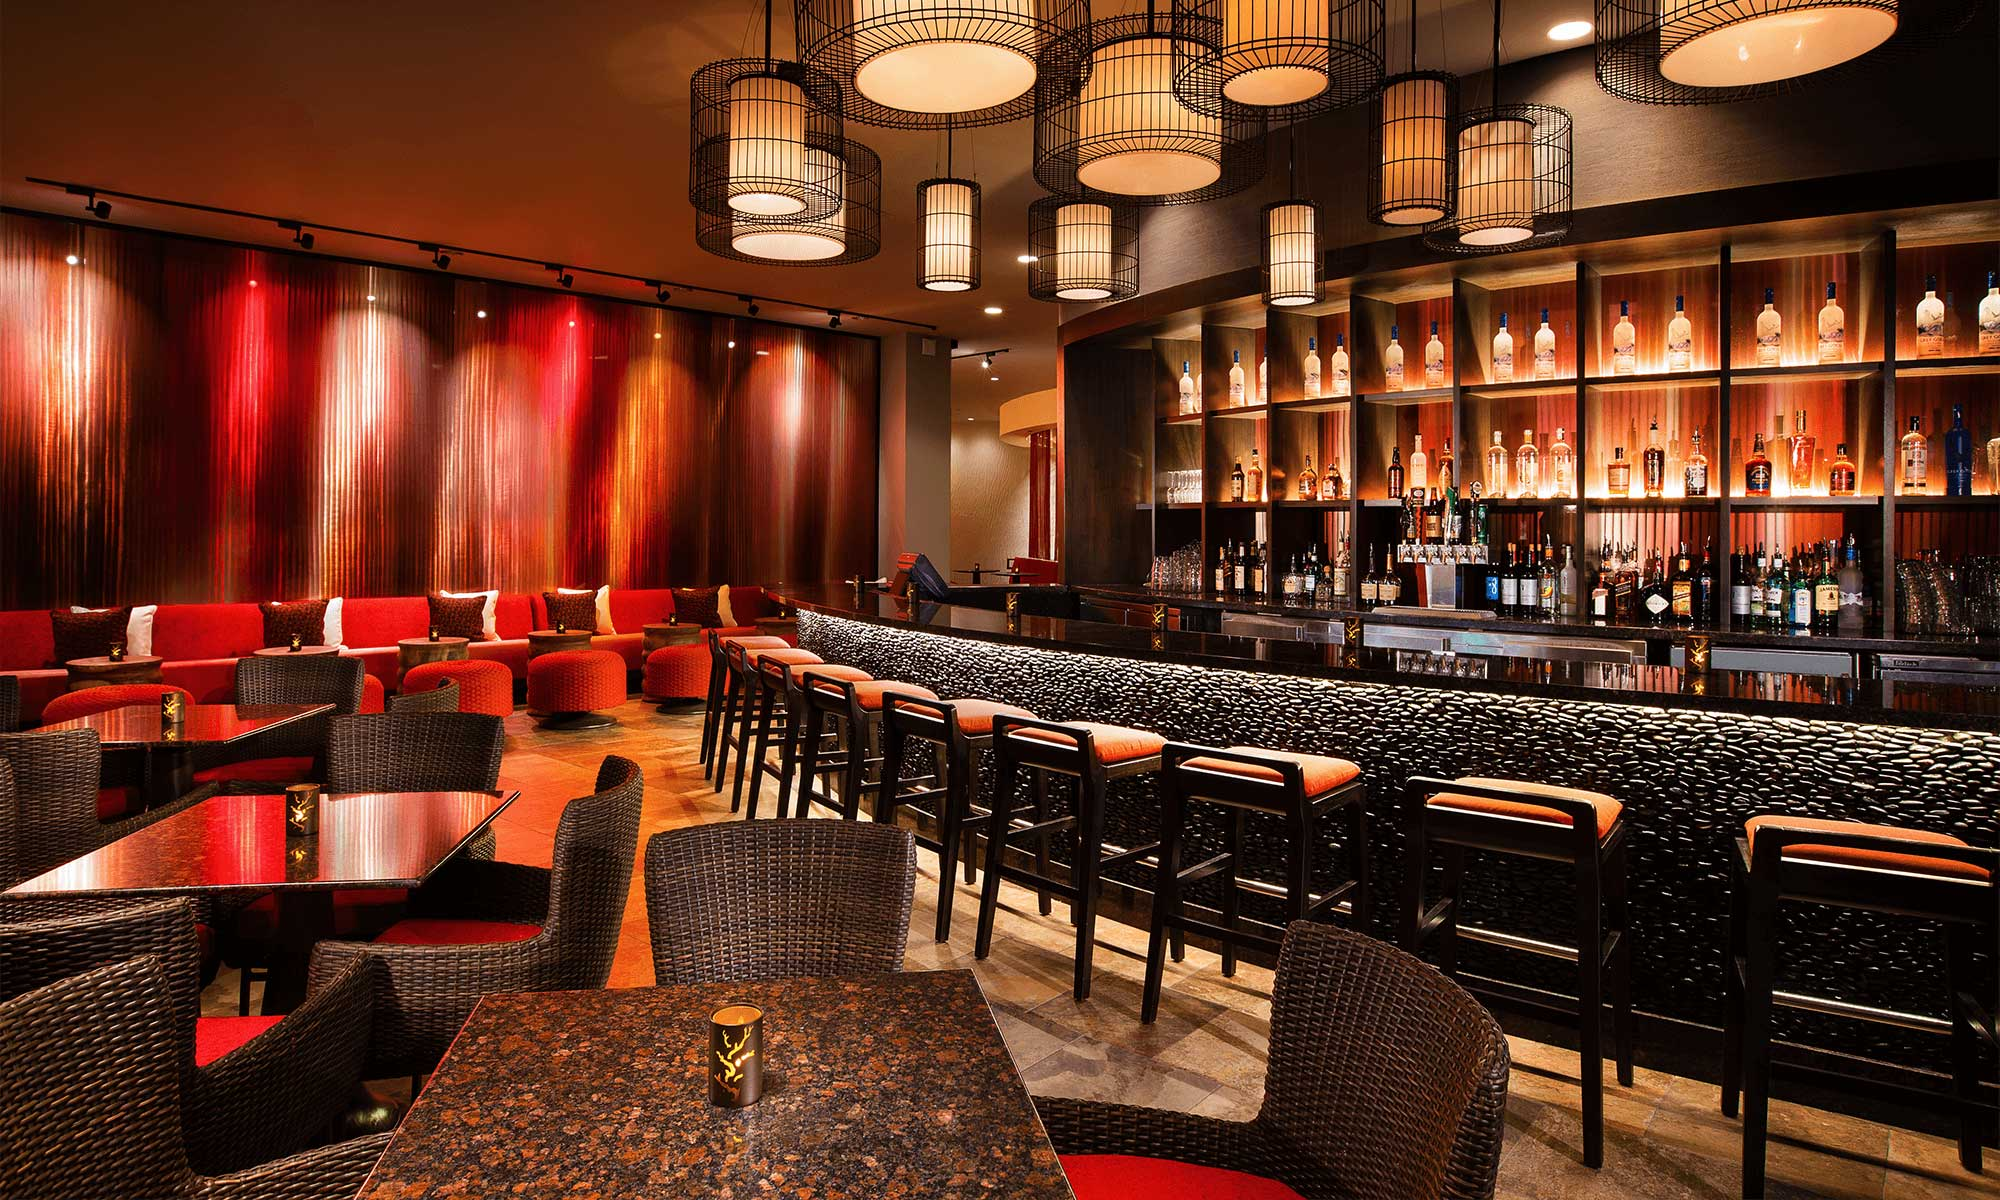 Sheraton Waikiki Hotel- Rumfire Waikiki Restaurant and Nightclub , interior design and layout